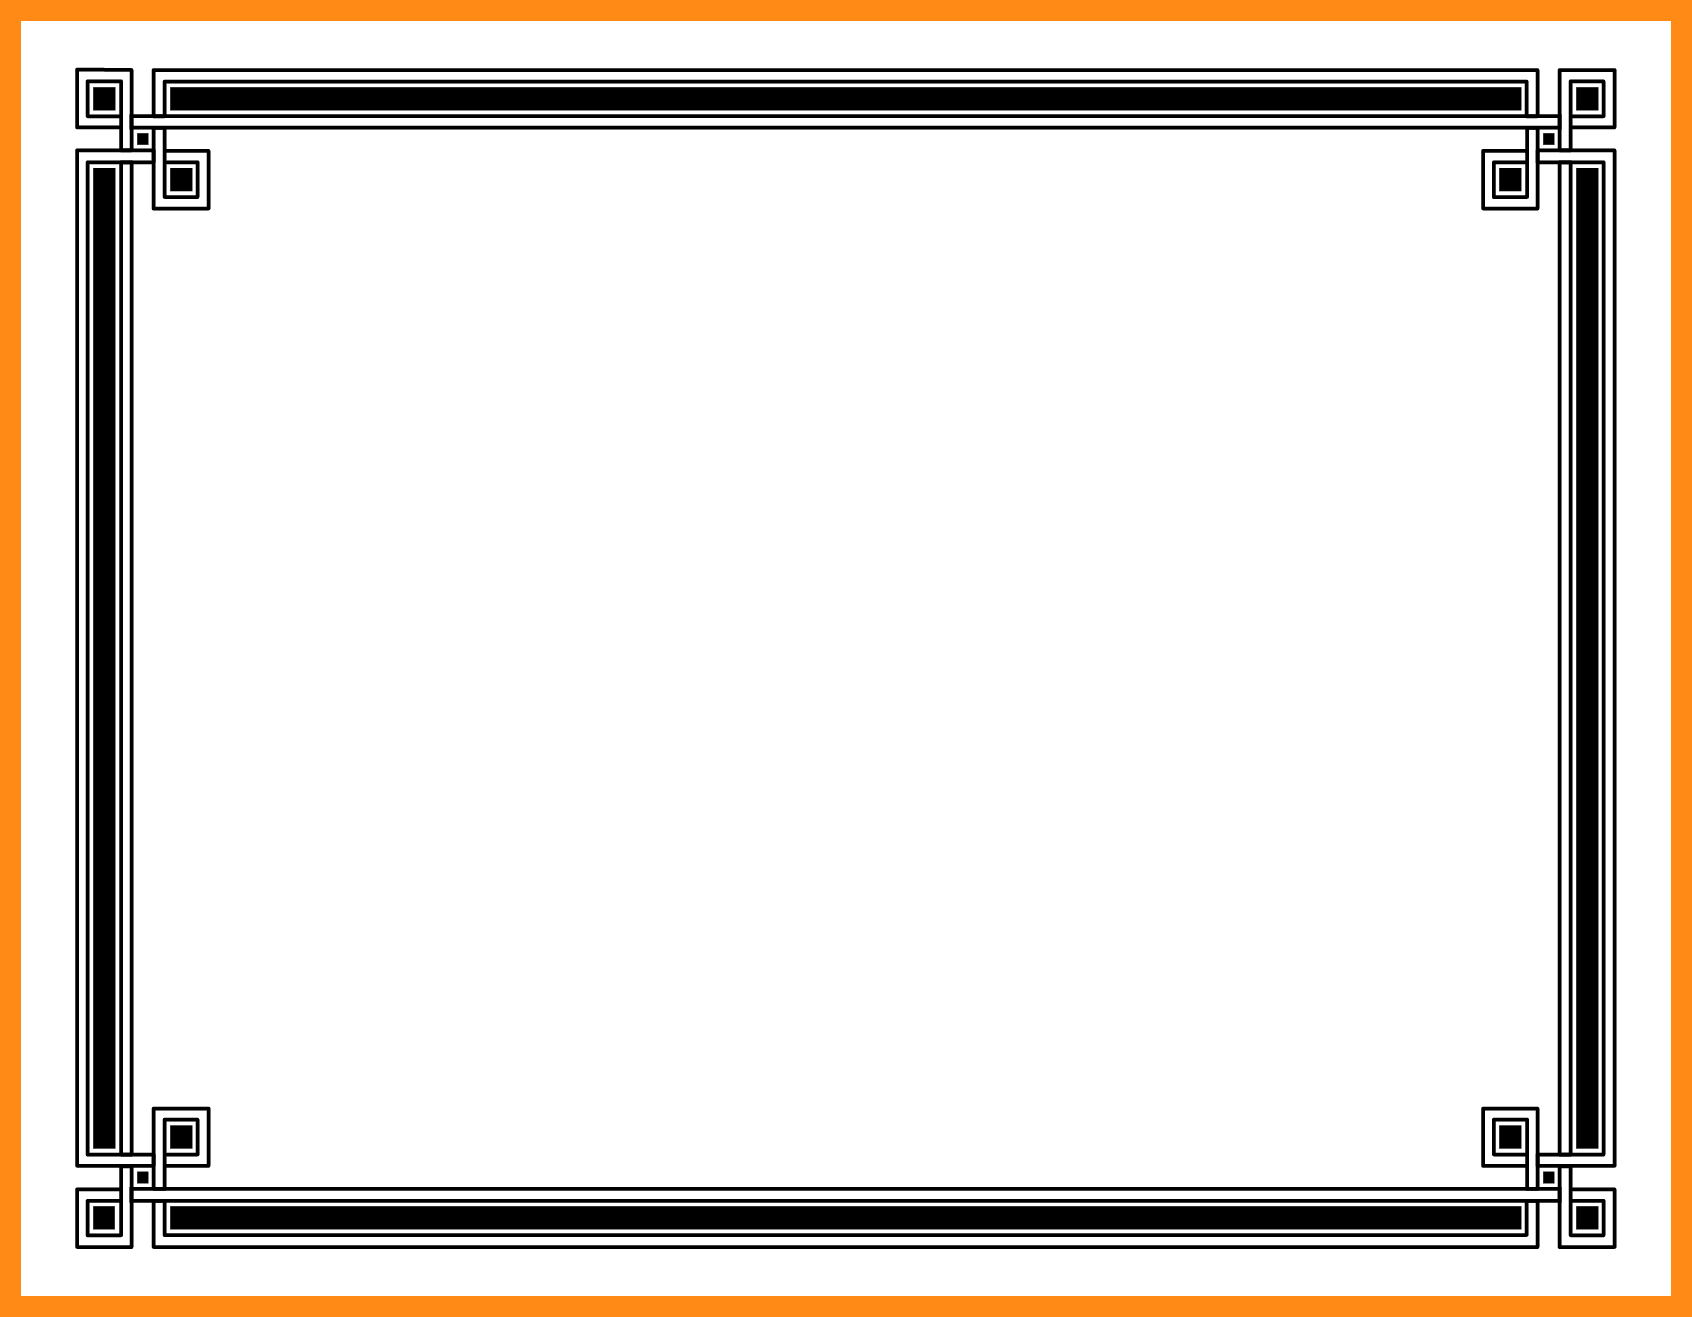 certificate border png hd.ce6a9dcd4cbdd7d1cb0ba4f1a41af034.png[/caption] - Borders PNG HD